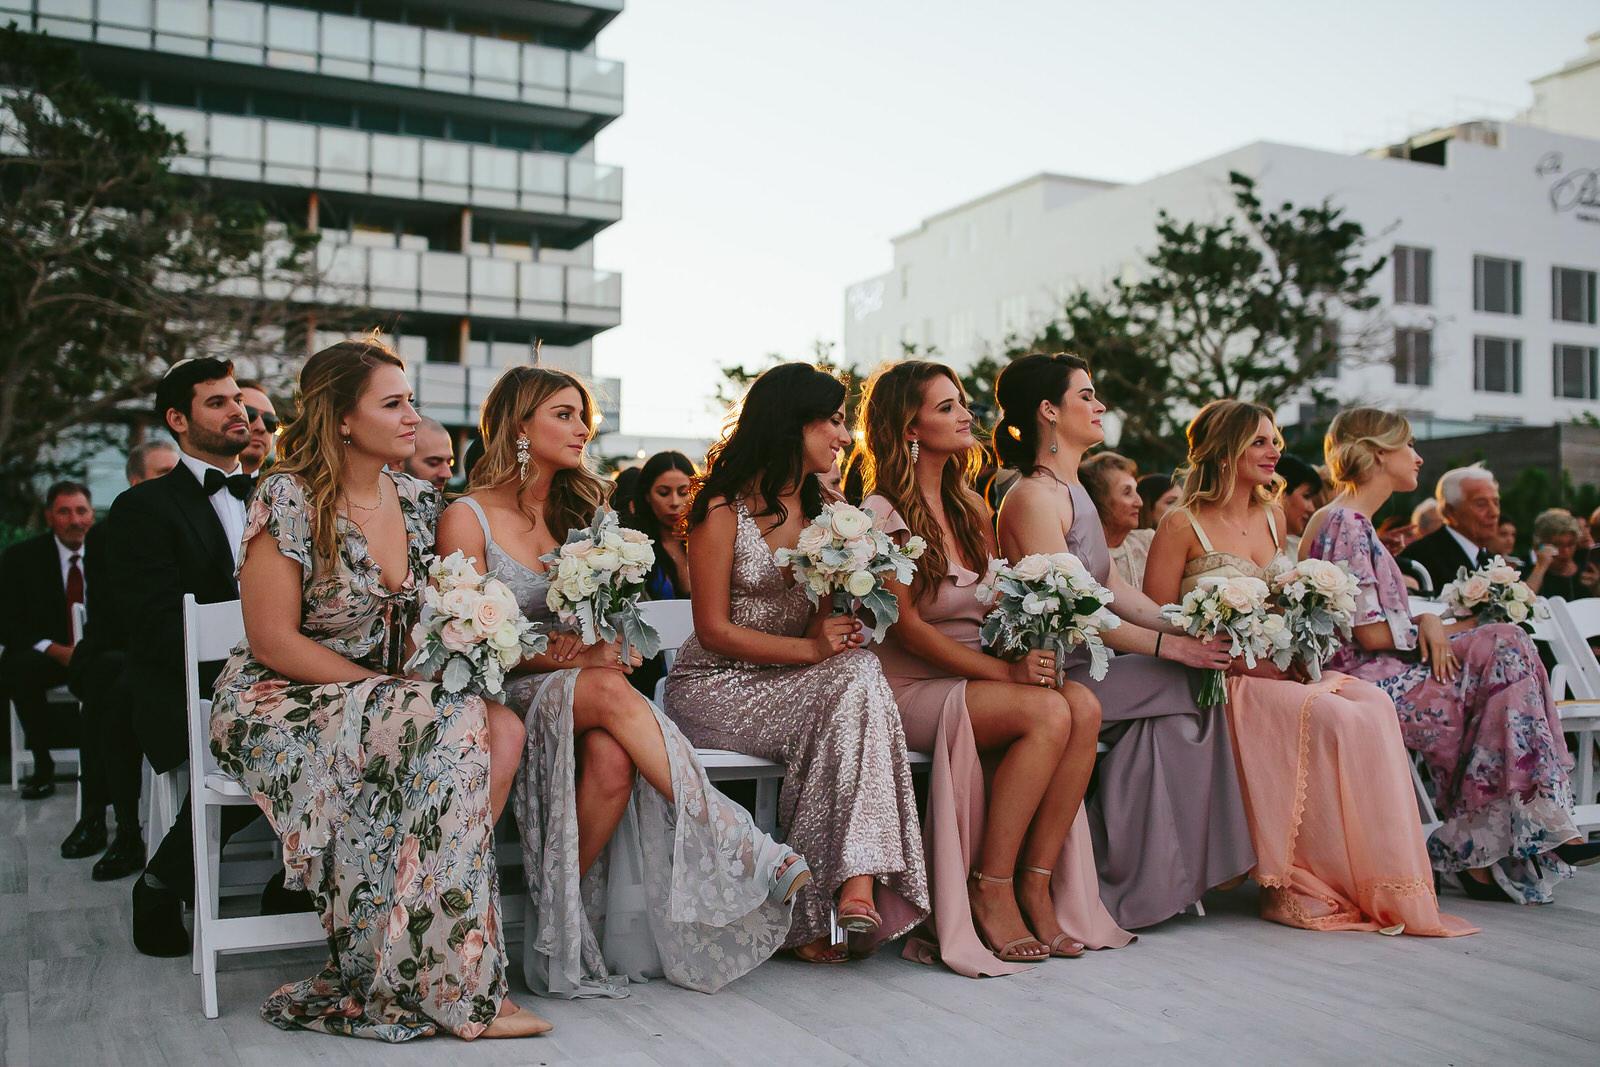 miami_beach_edition_wedding_tiny_house_photo-44.jpg